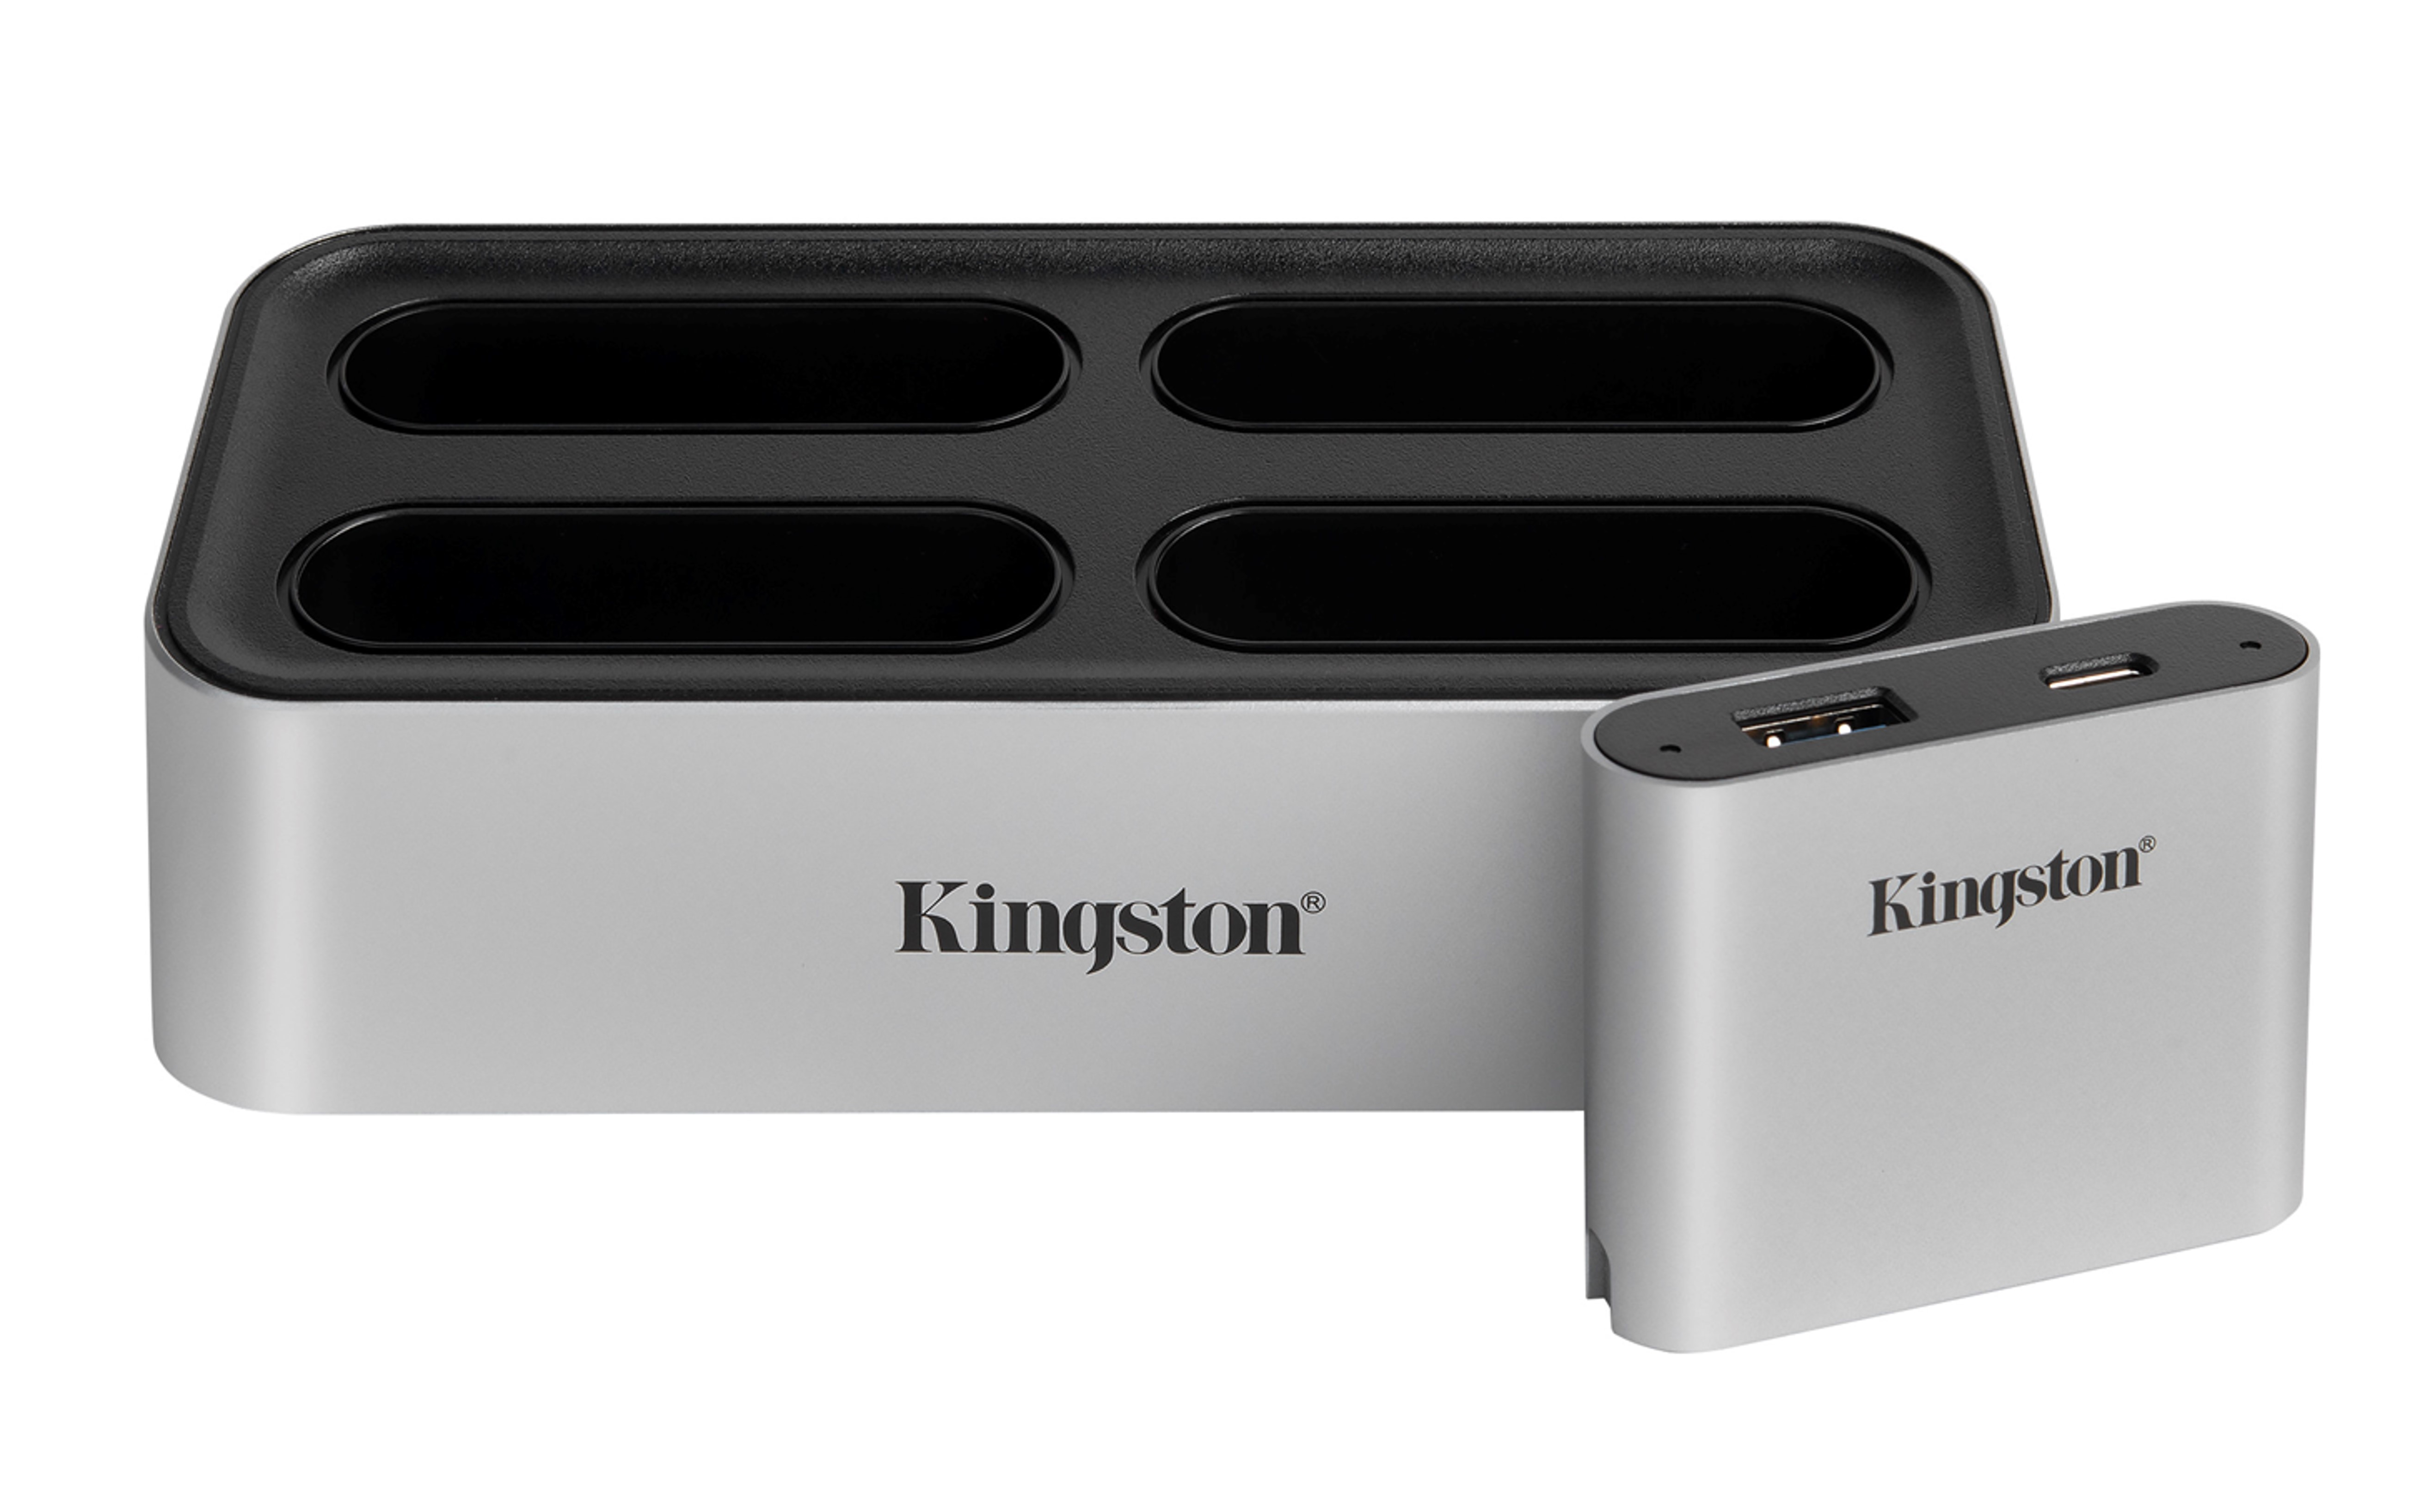 ces workflow station Kingston ปล่อยตัวอย่างไลน์ผลิตภัณฑ์ SSD NVMe รุ่นใหม่ และเปิดตัว Kingston Workflow Station พร้อม Readers